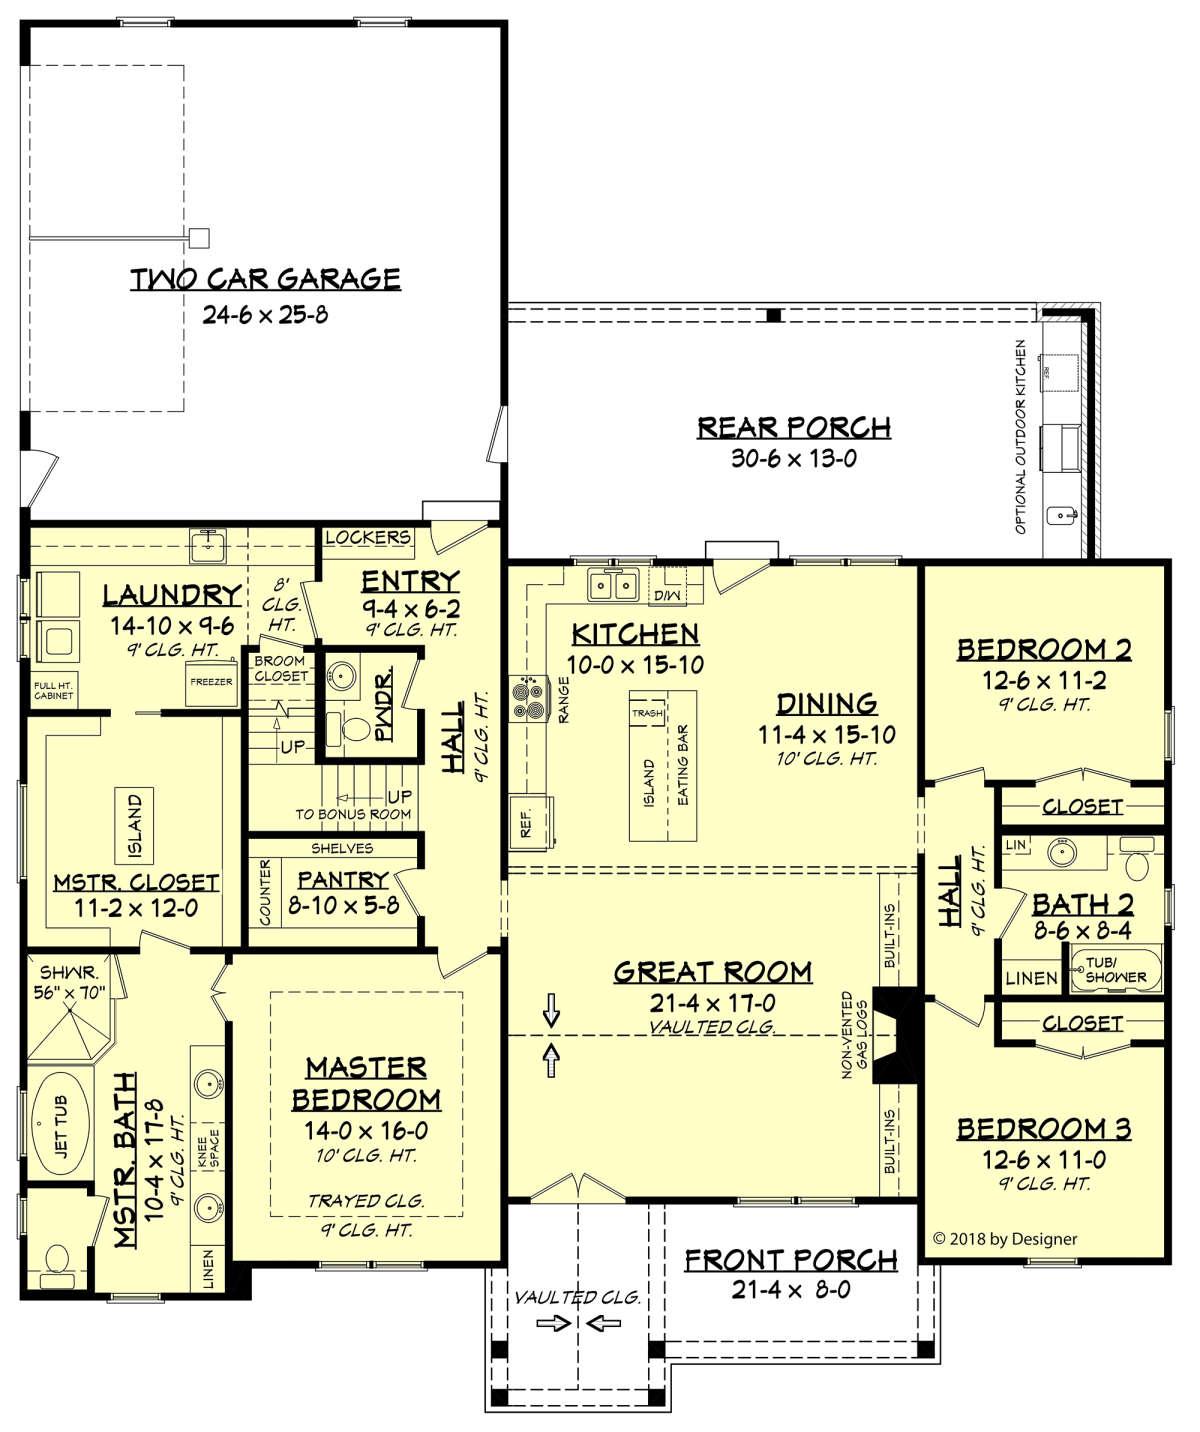 Modern Farmhouse Plan 2 201 Square Feet 3 Bedrooms 2 5 Bathrooms 041 00190